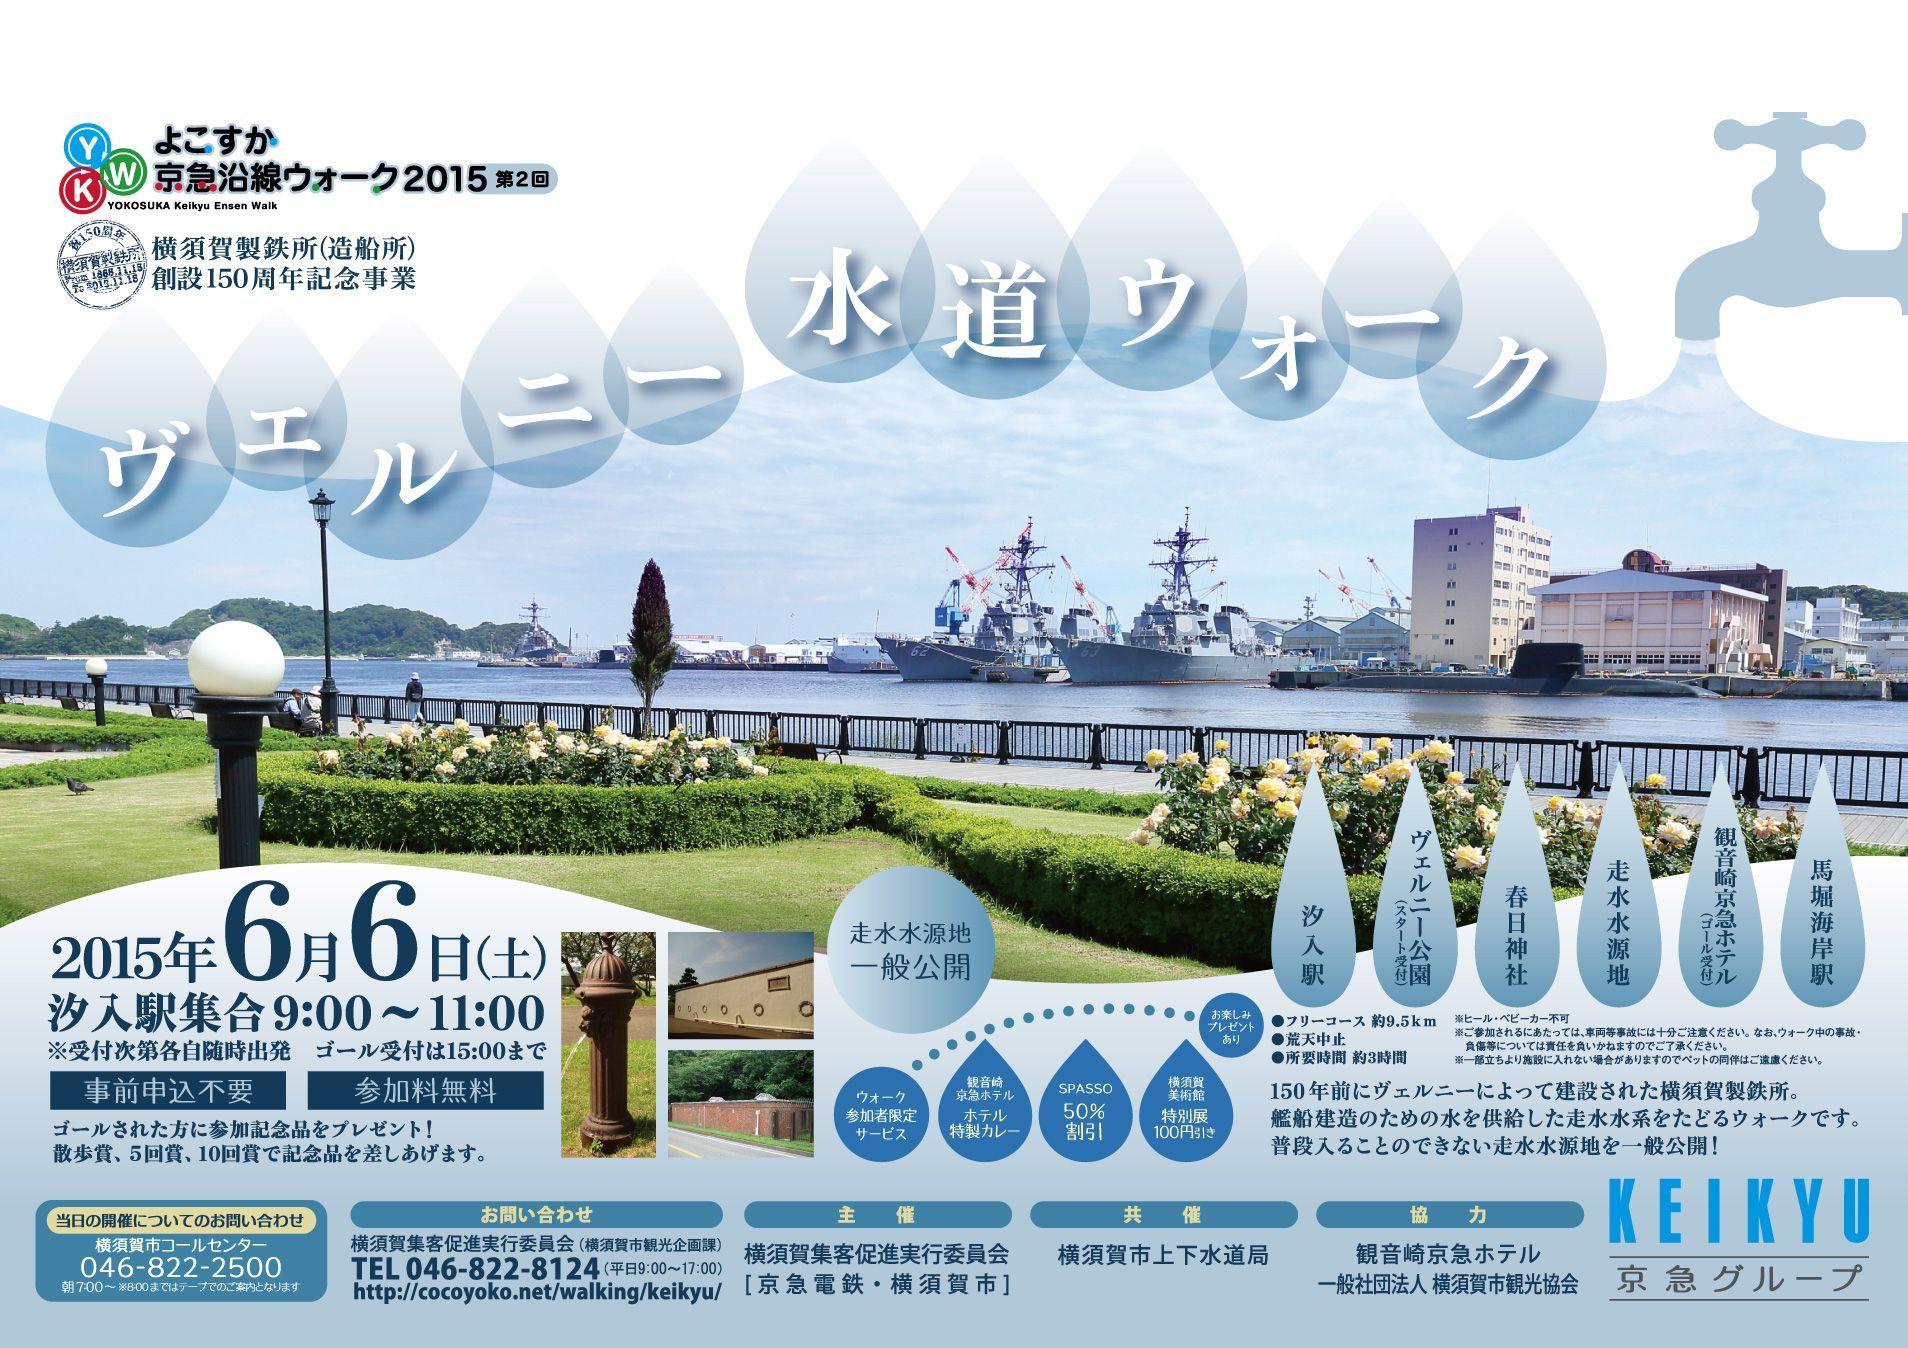 2015年度【第2回】「ヴェルニー水道ウォーク~横須賀製鉄所(造船所)創設150周年記念事業」